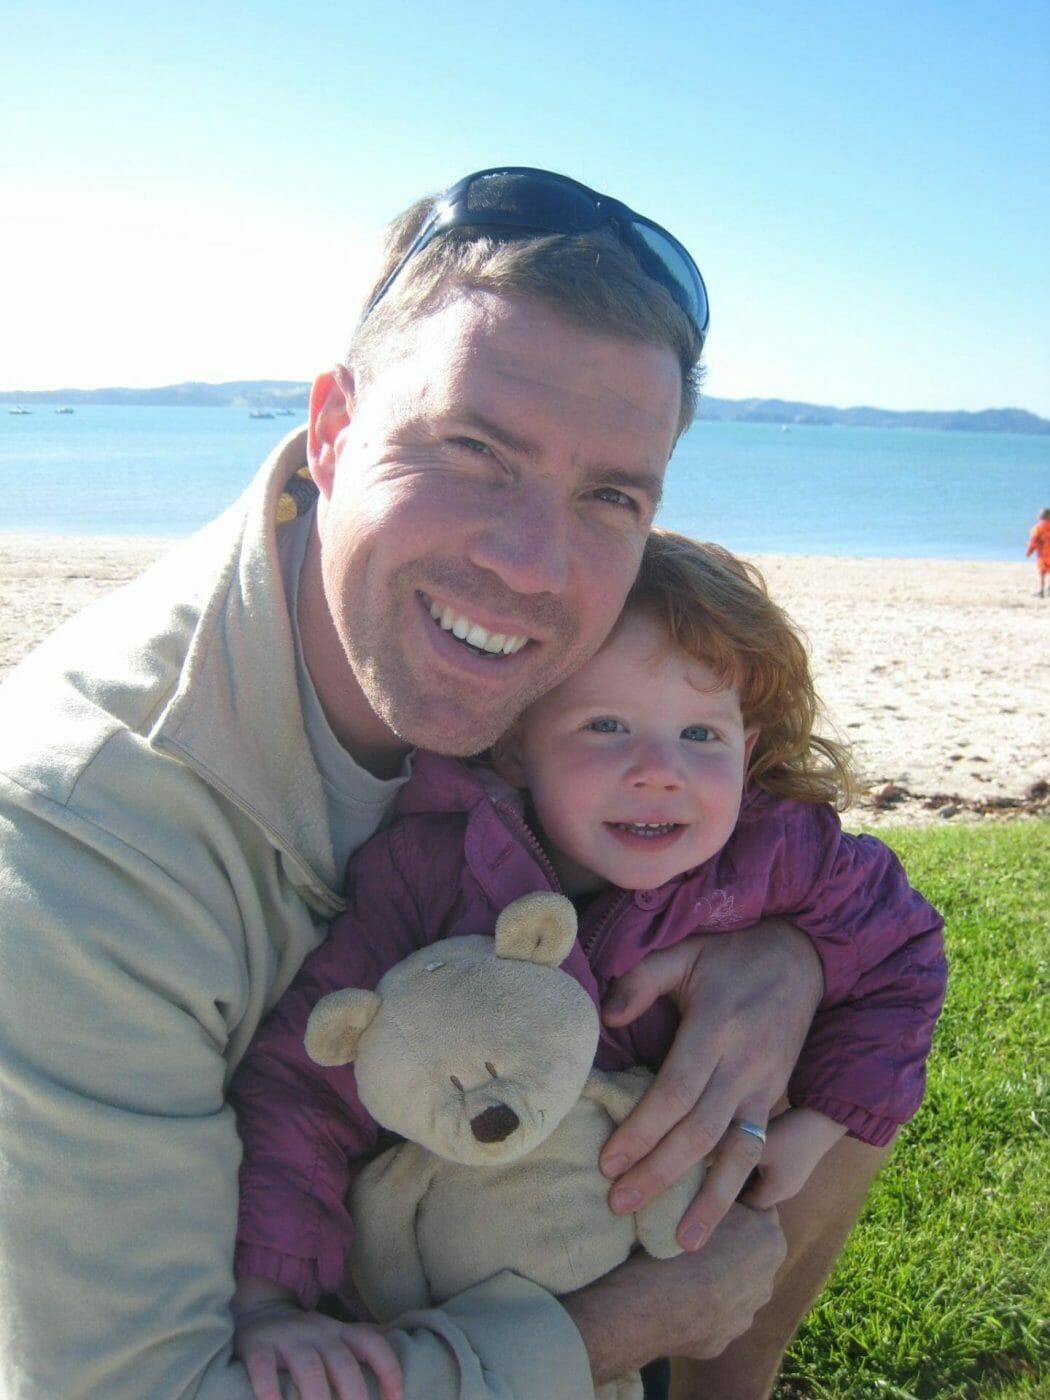 JP with his daughter Ela